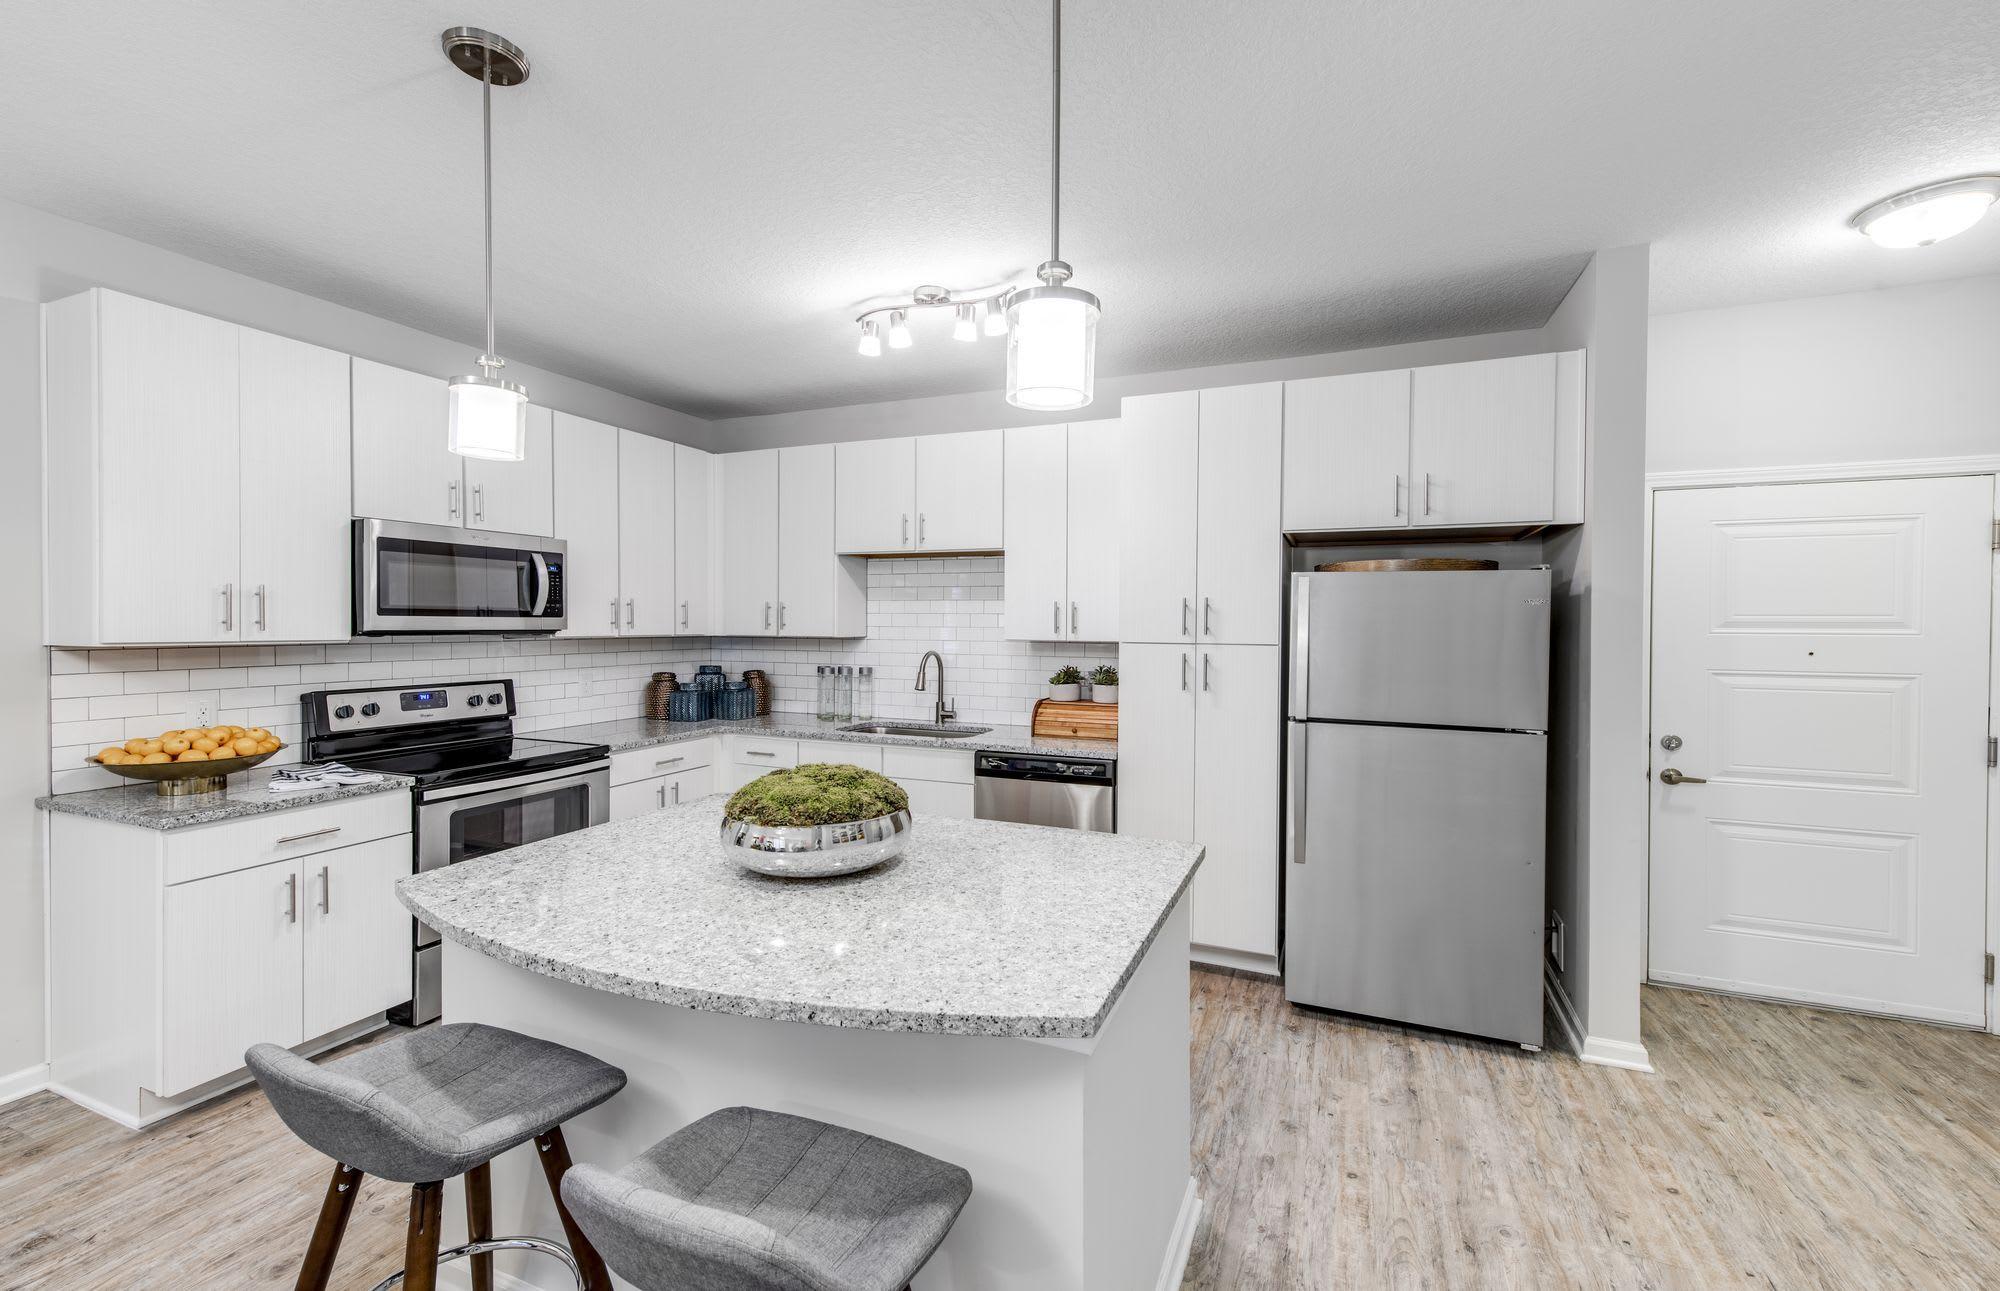 Craigslist Tampa Kitchen Cabinets : Kitchen Cabinets Sale ...